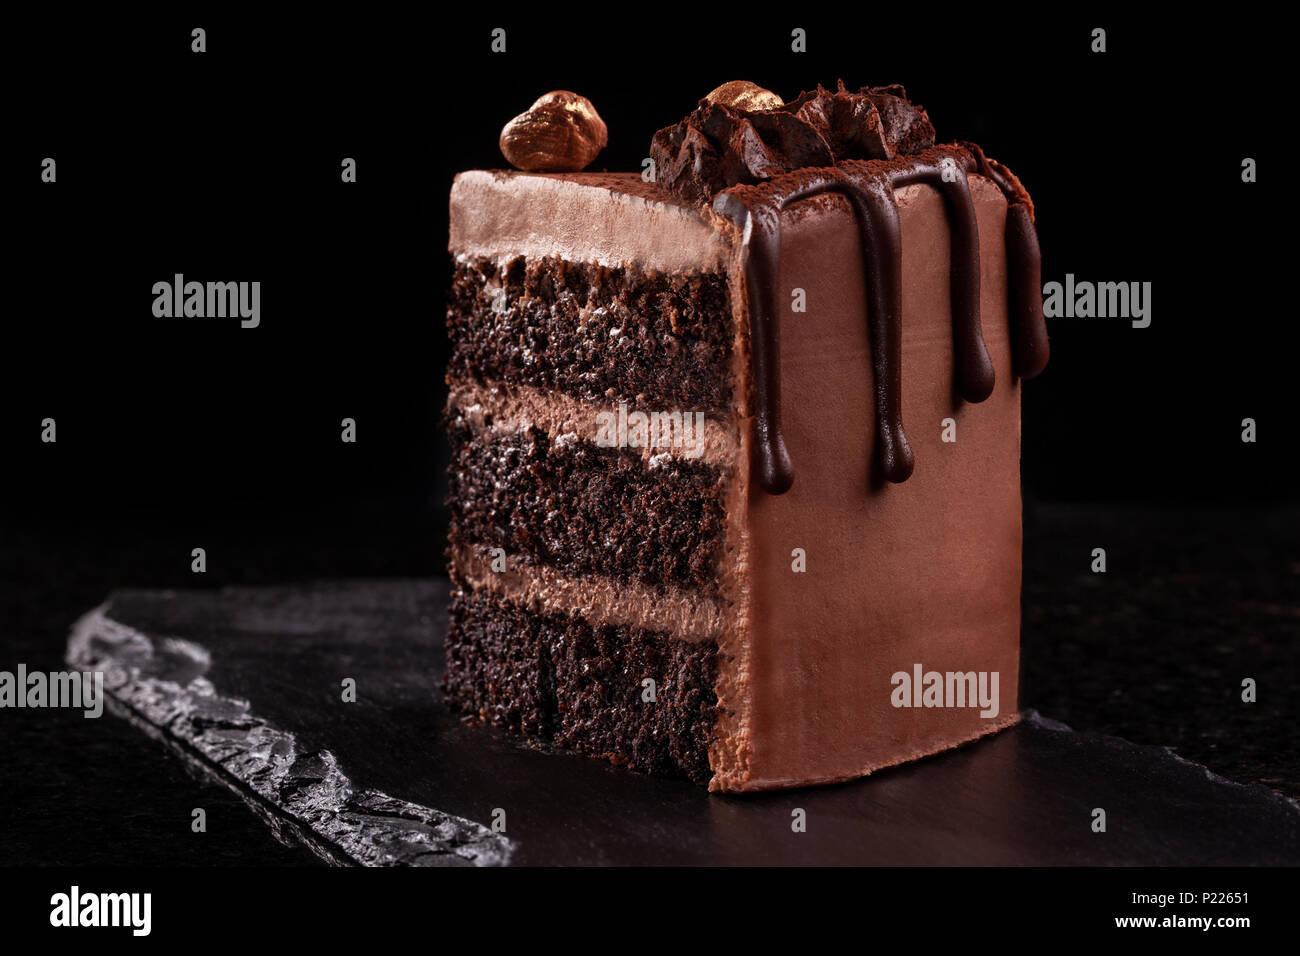 Piece of chocolate cake. Chocolate mousse cake slice on a black board, black background. - Stock Image